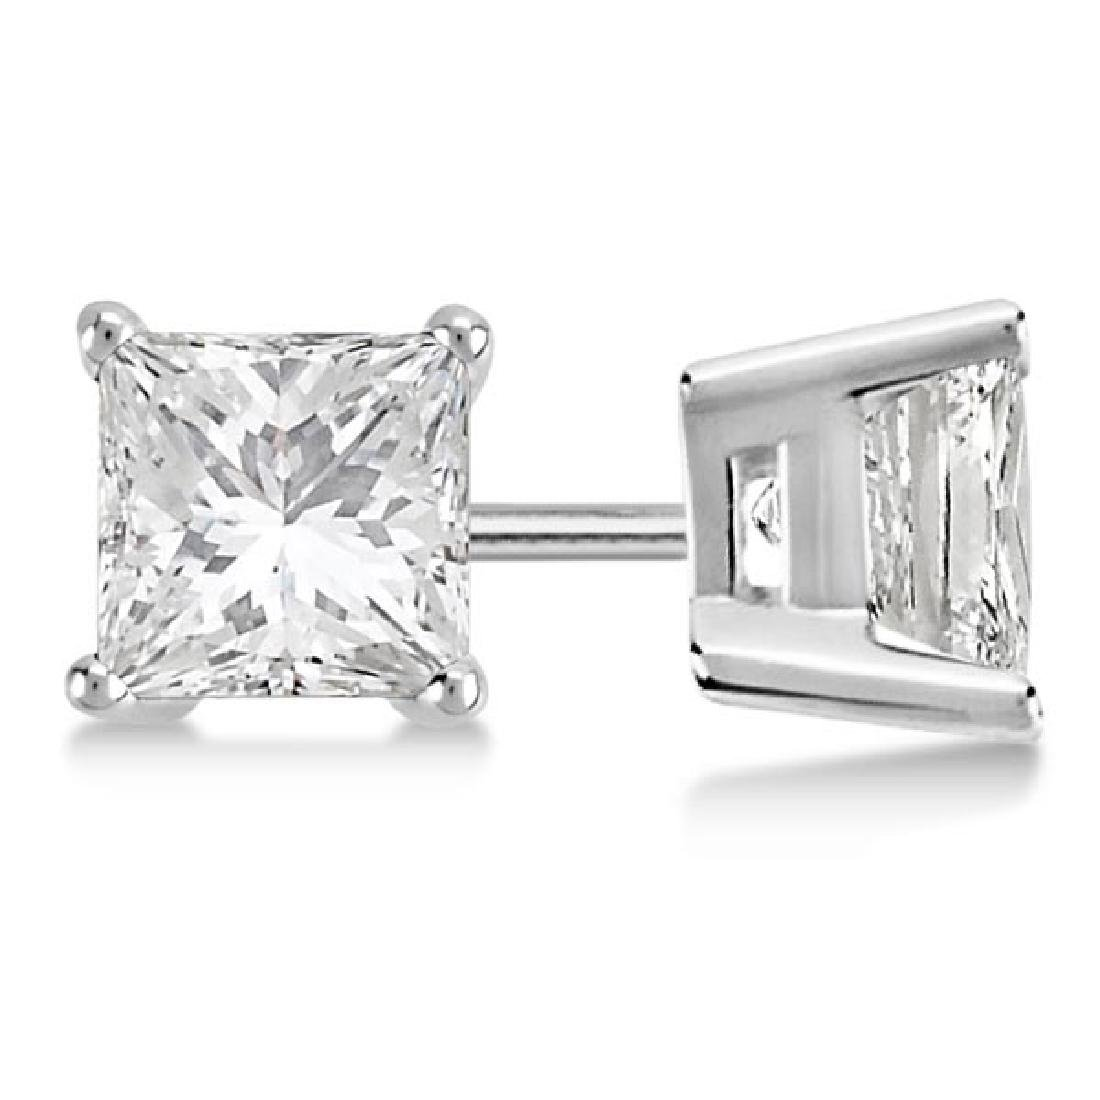 Certified 0.76 CTW Princess Diamond Stud Earrings F/I1